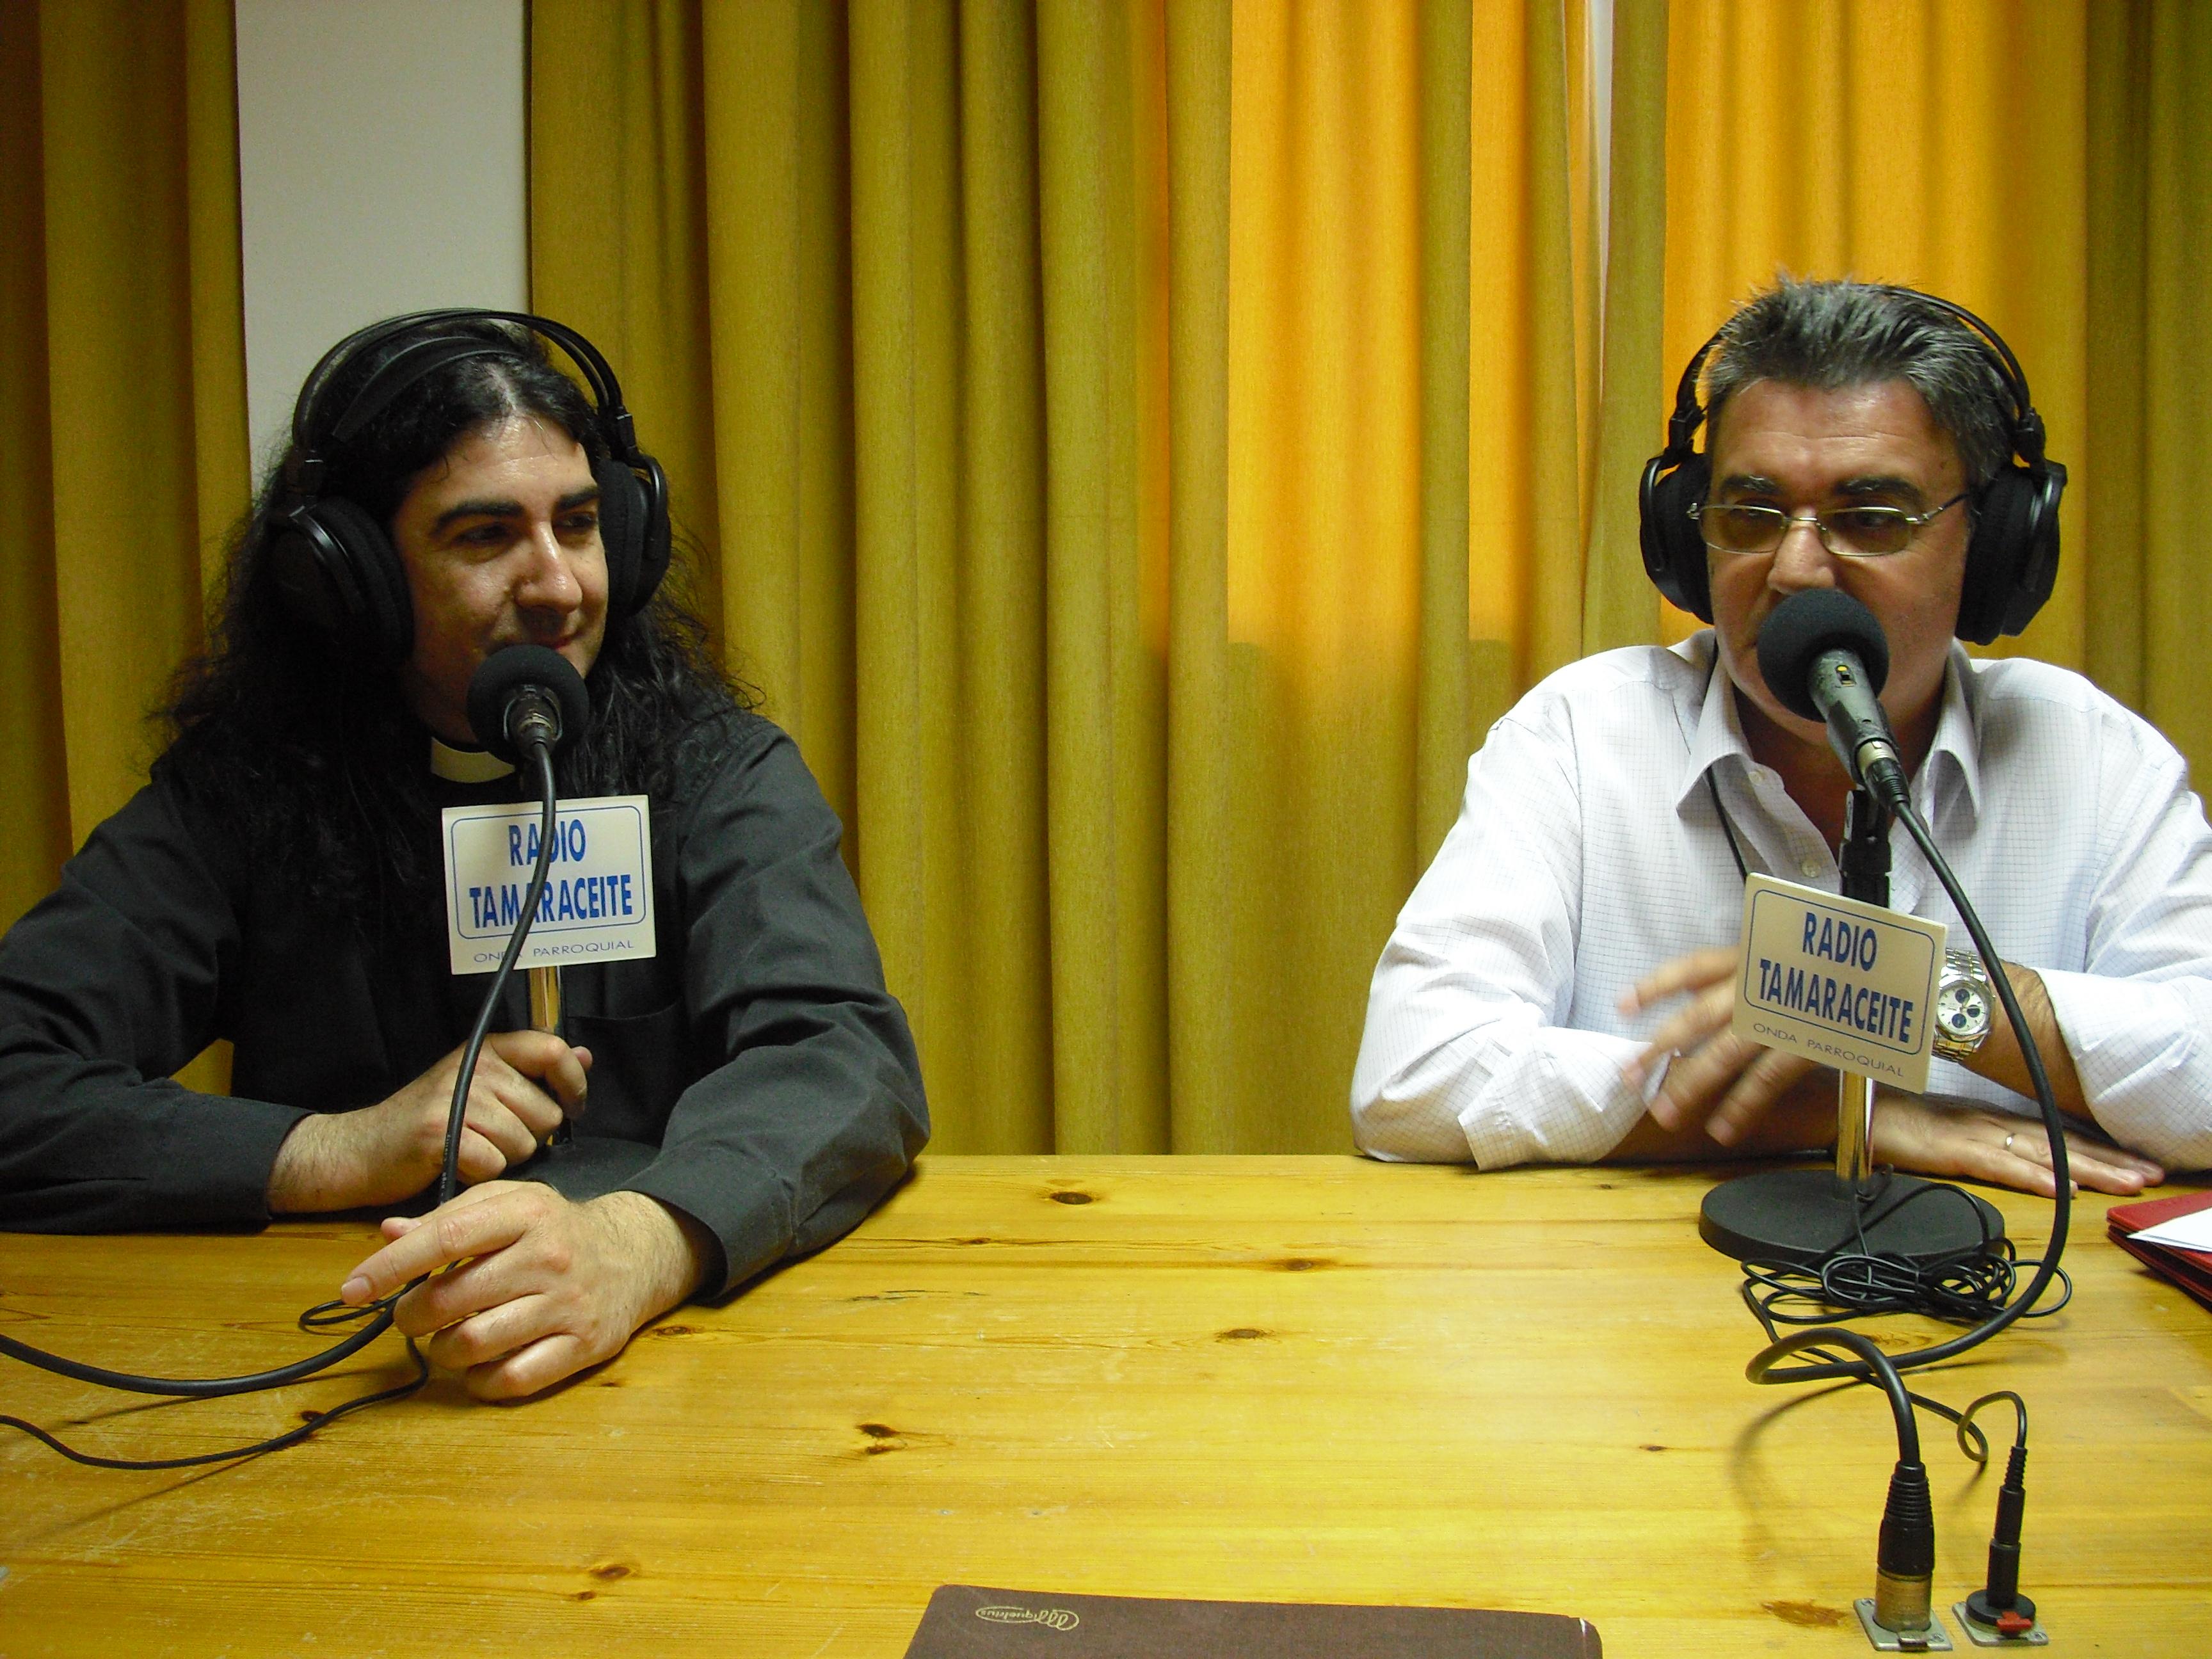 Colaboradores de Radio Tamaraceite